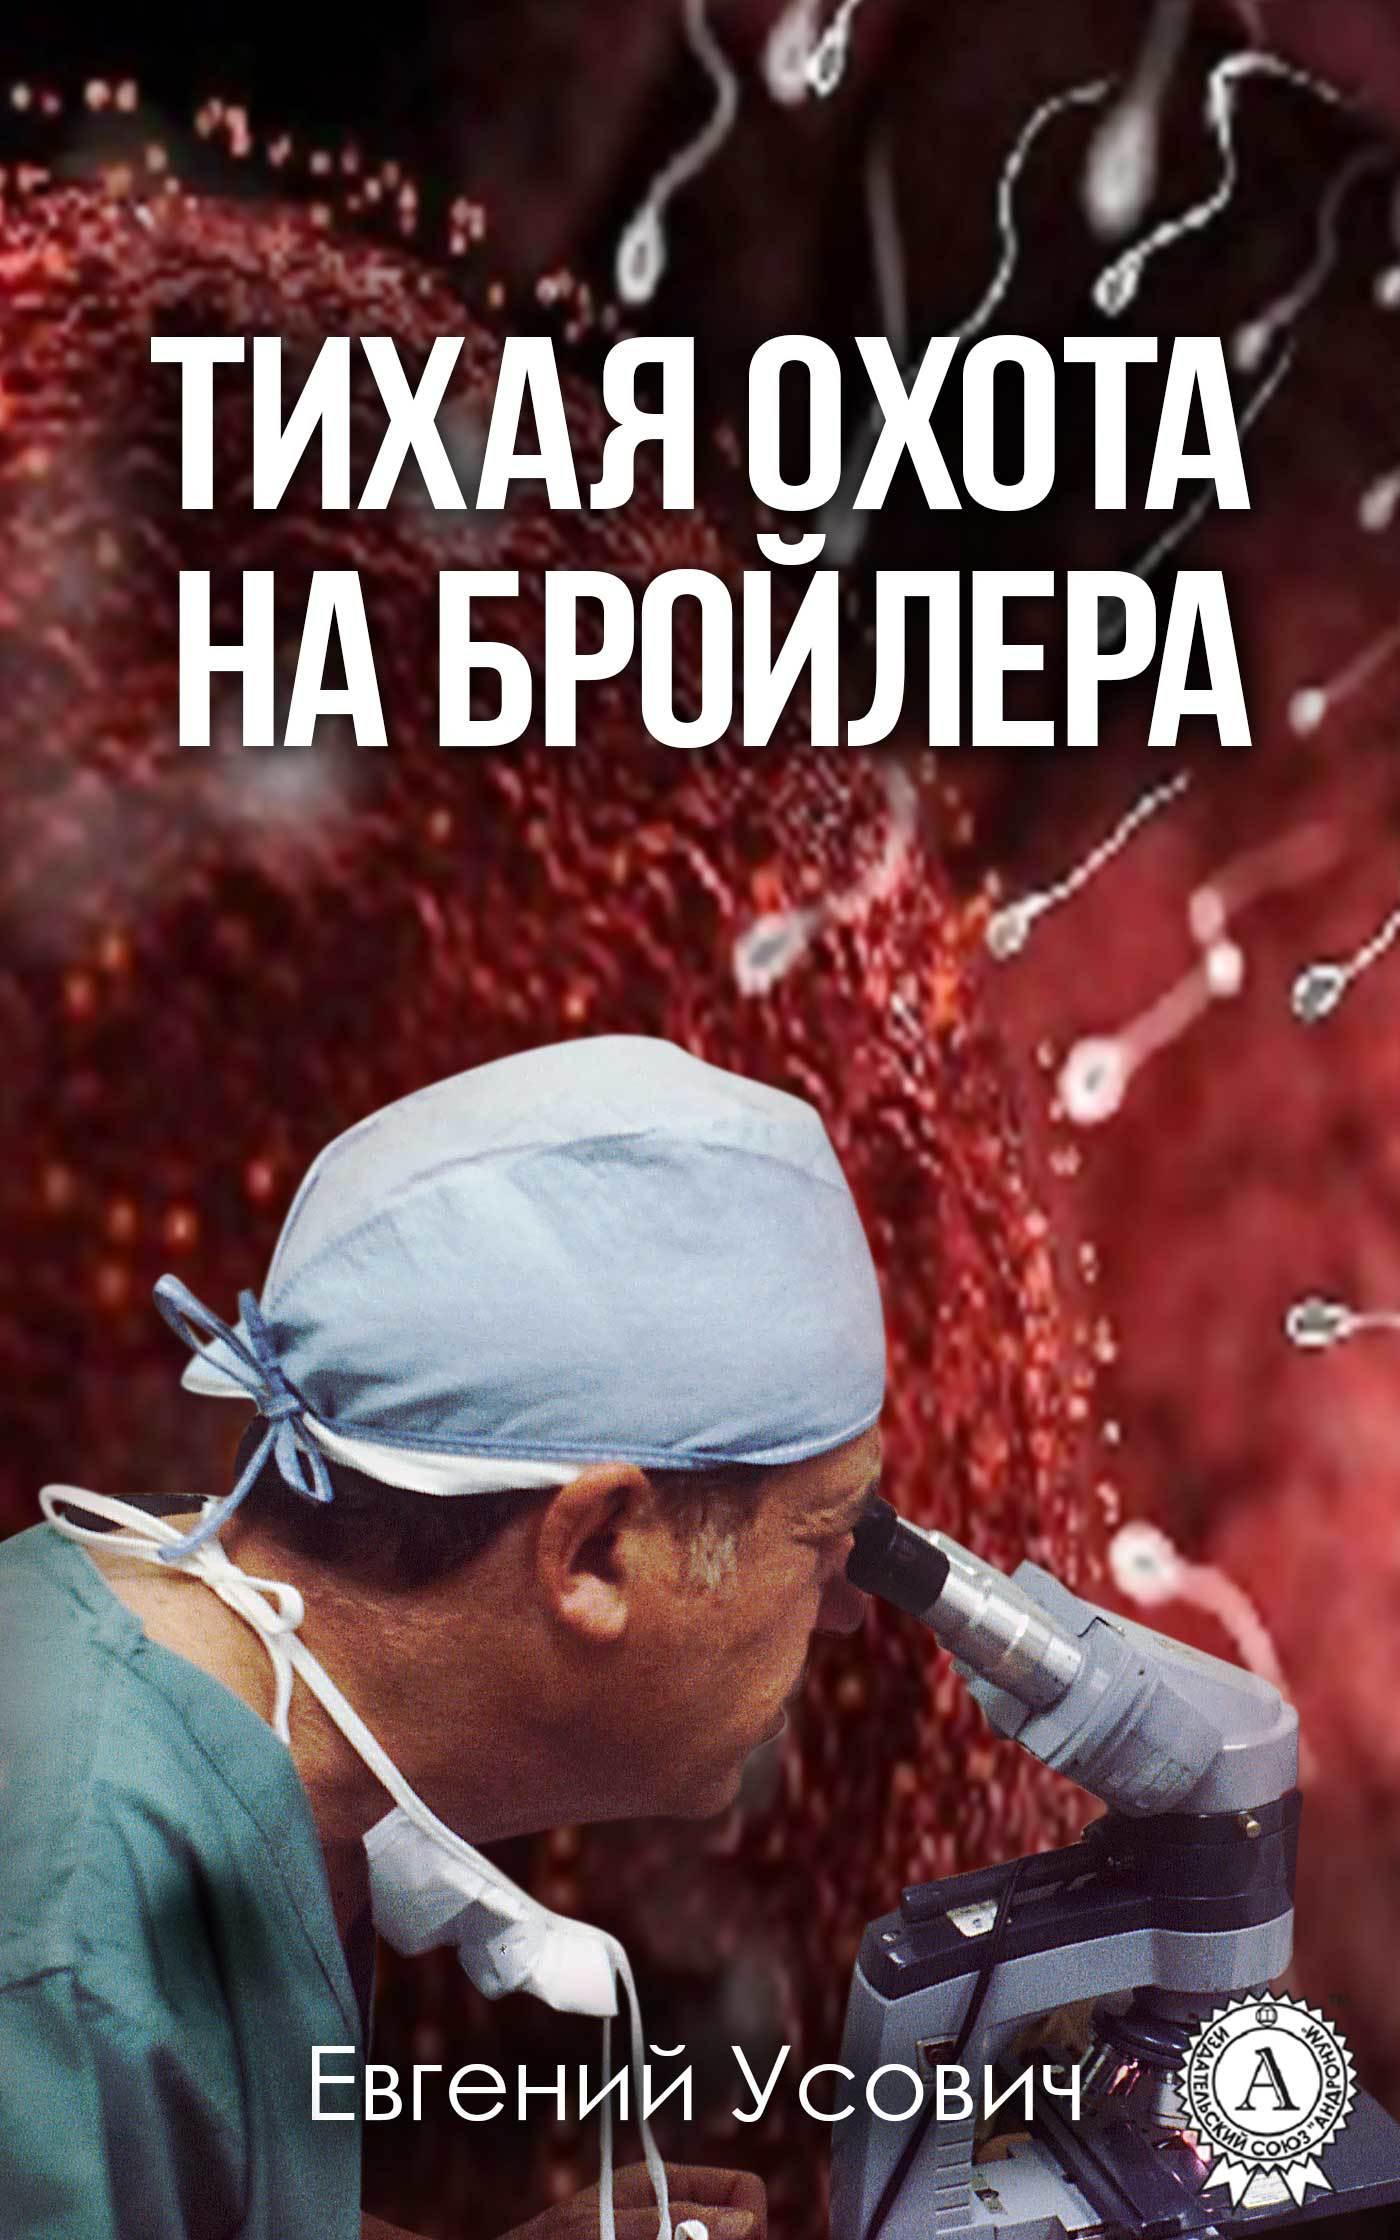 Евгений Усович Тихая охота на бройлера без прописки справку в гаи